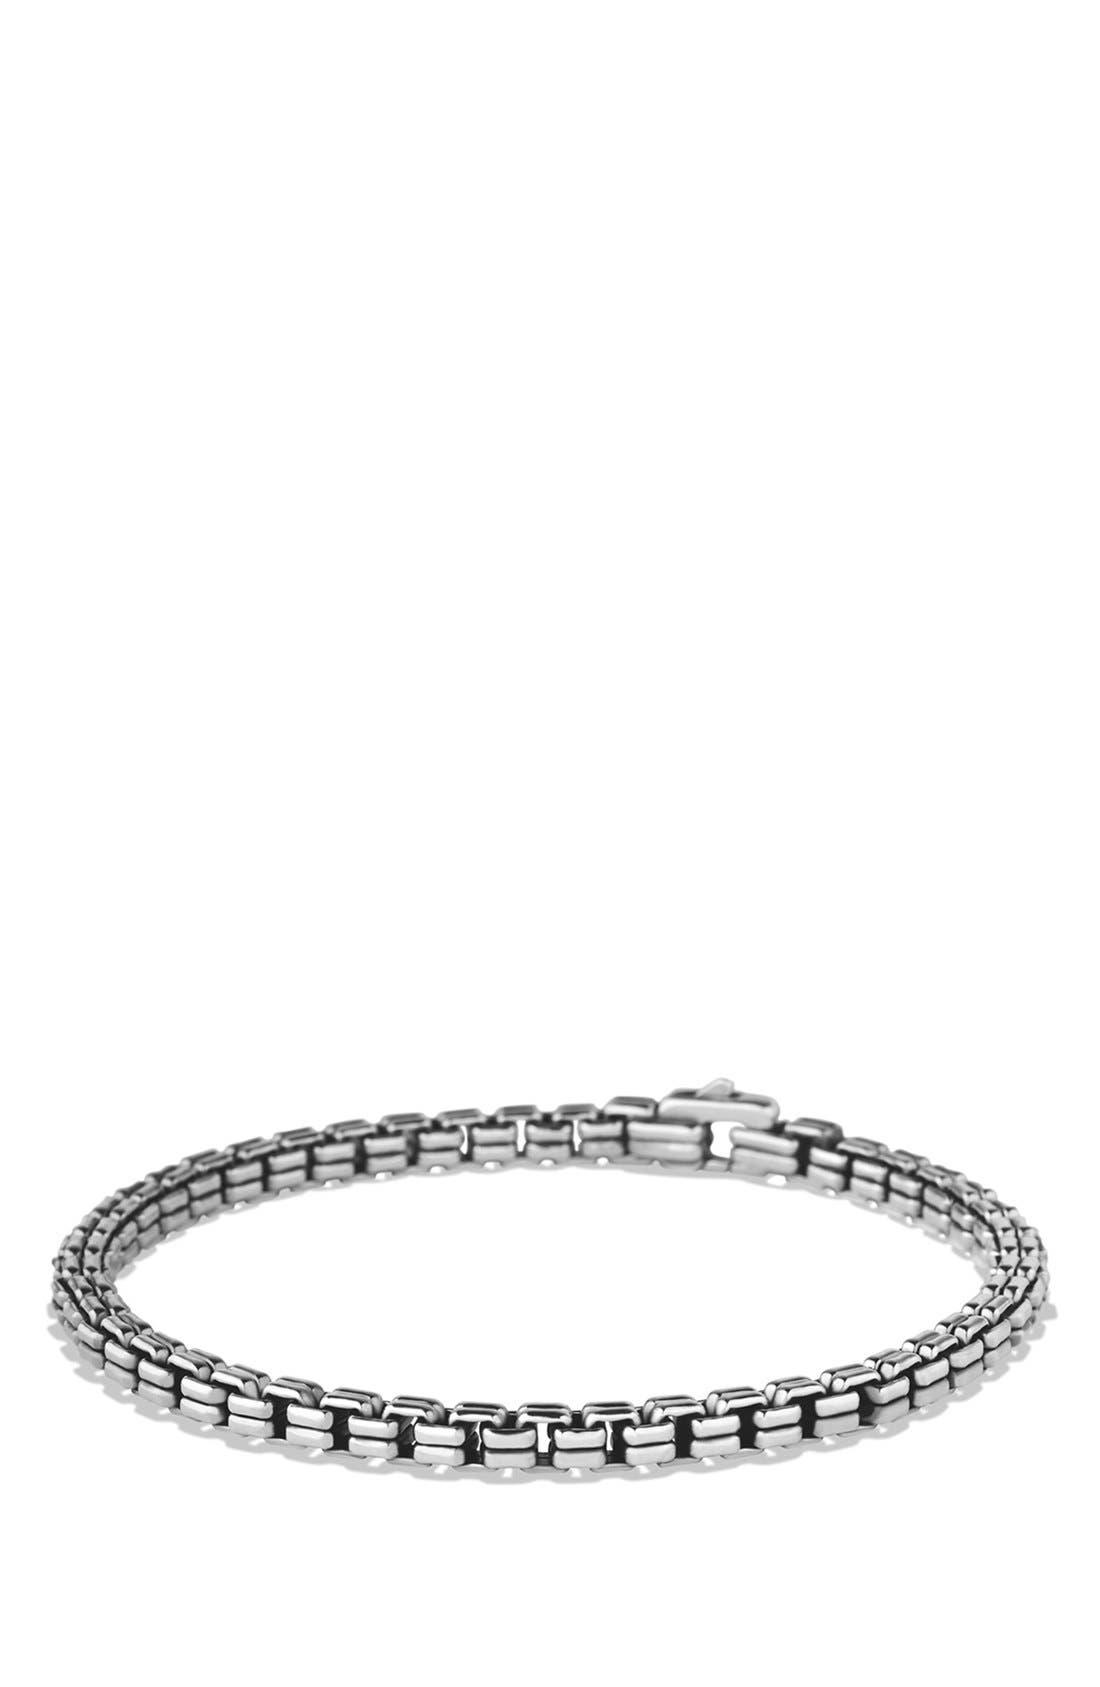 DAVID YURMAN,                             'Chain' Double Box Chain Bracelet,                             Main thumbnail 1, color,                             SILVER